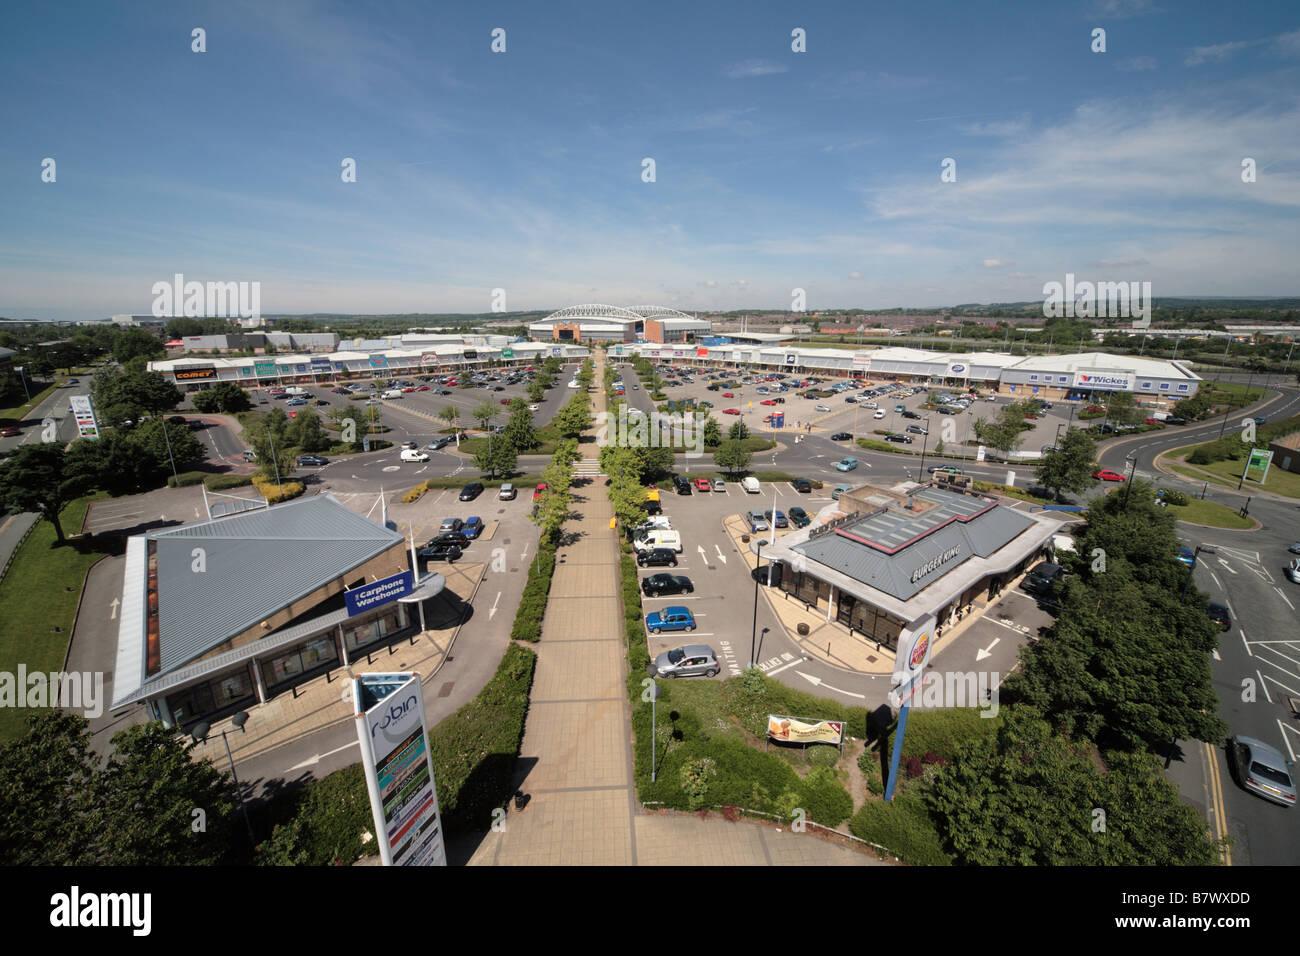 Robin Retail Park, with DW (formerly JJB) Stadium beyond, Wigan - Stock Image